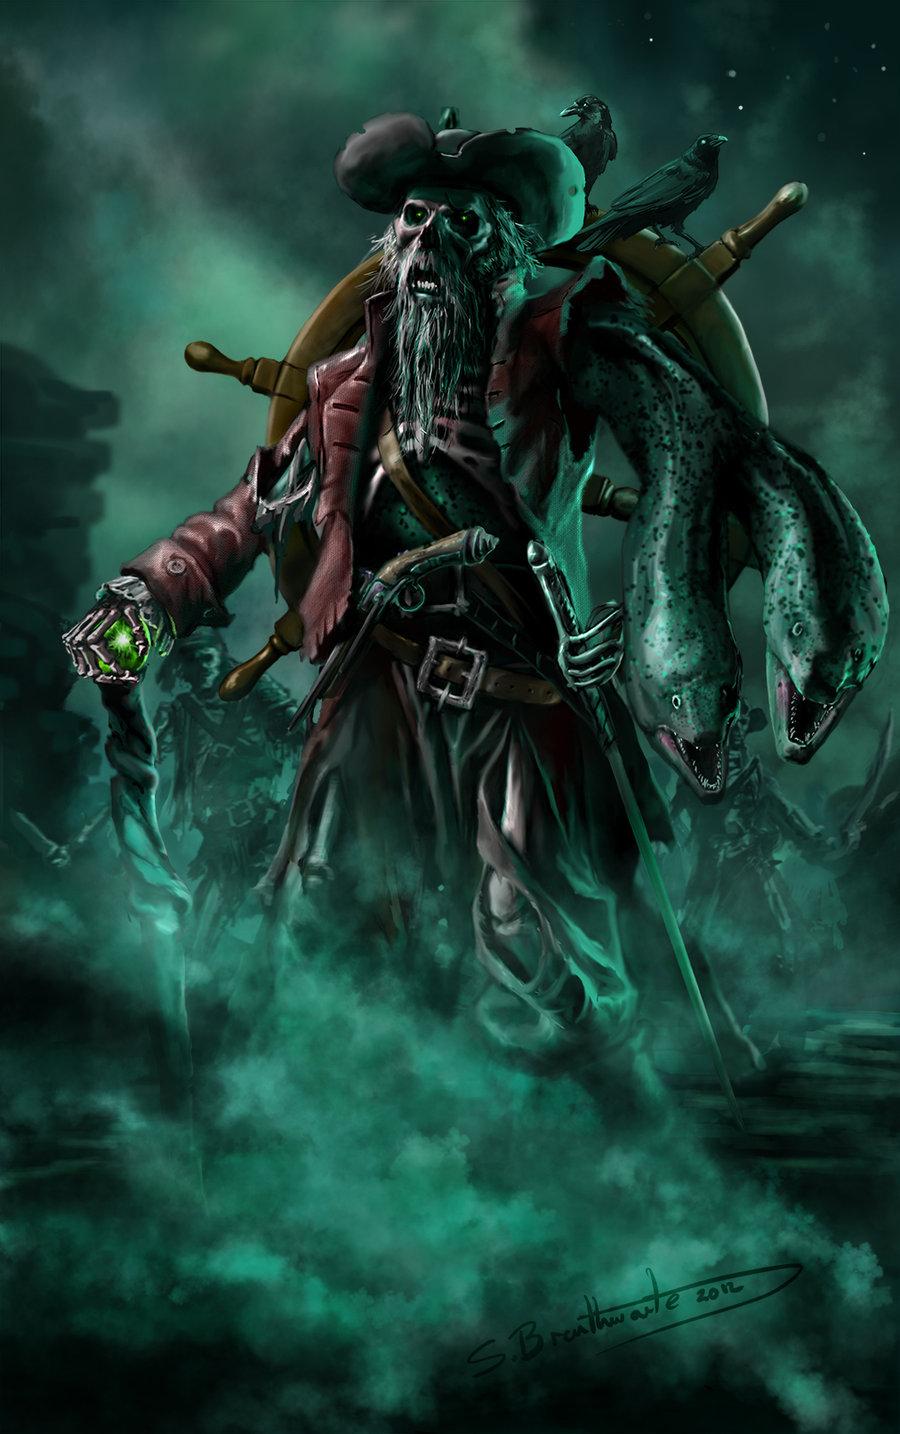 Pirate artwork